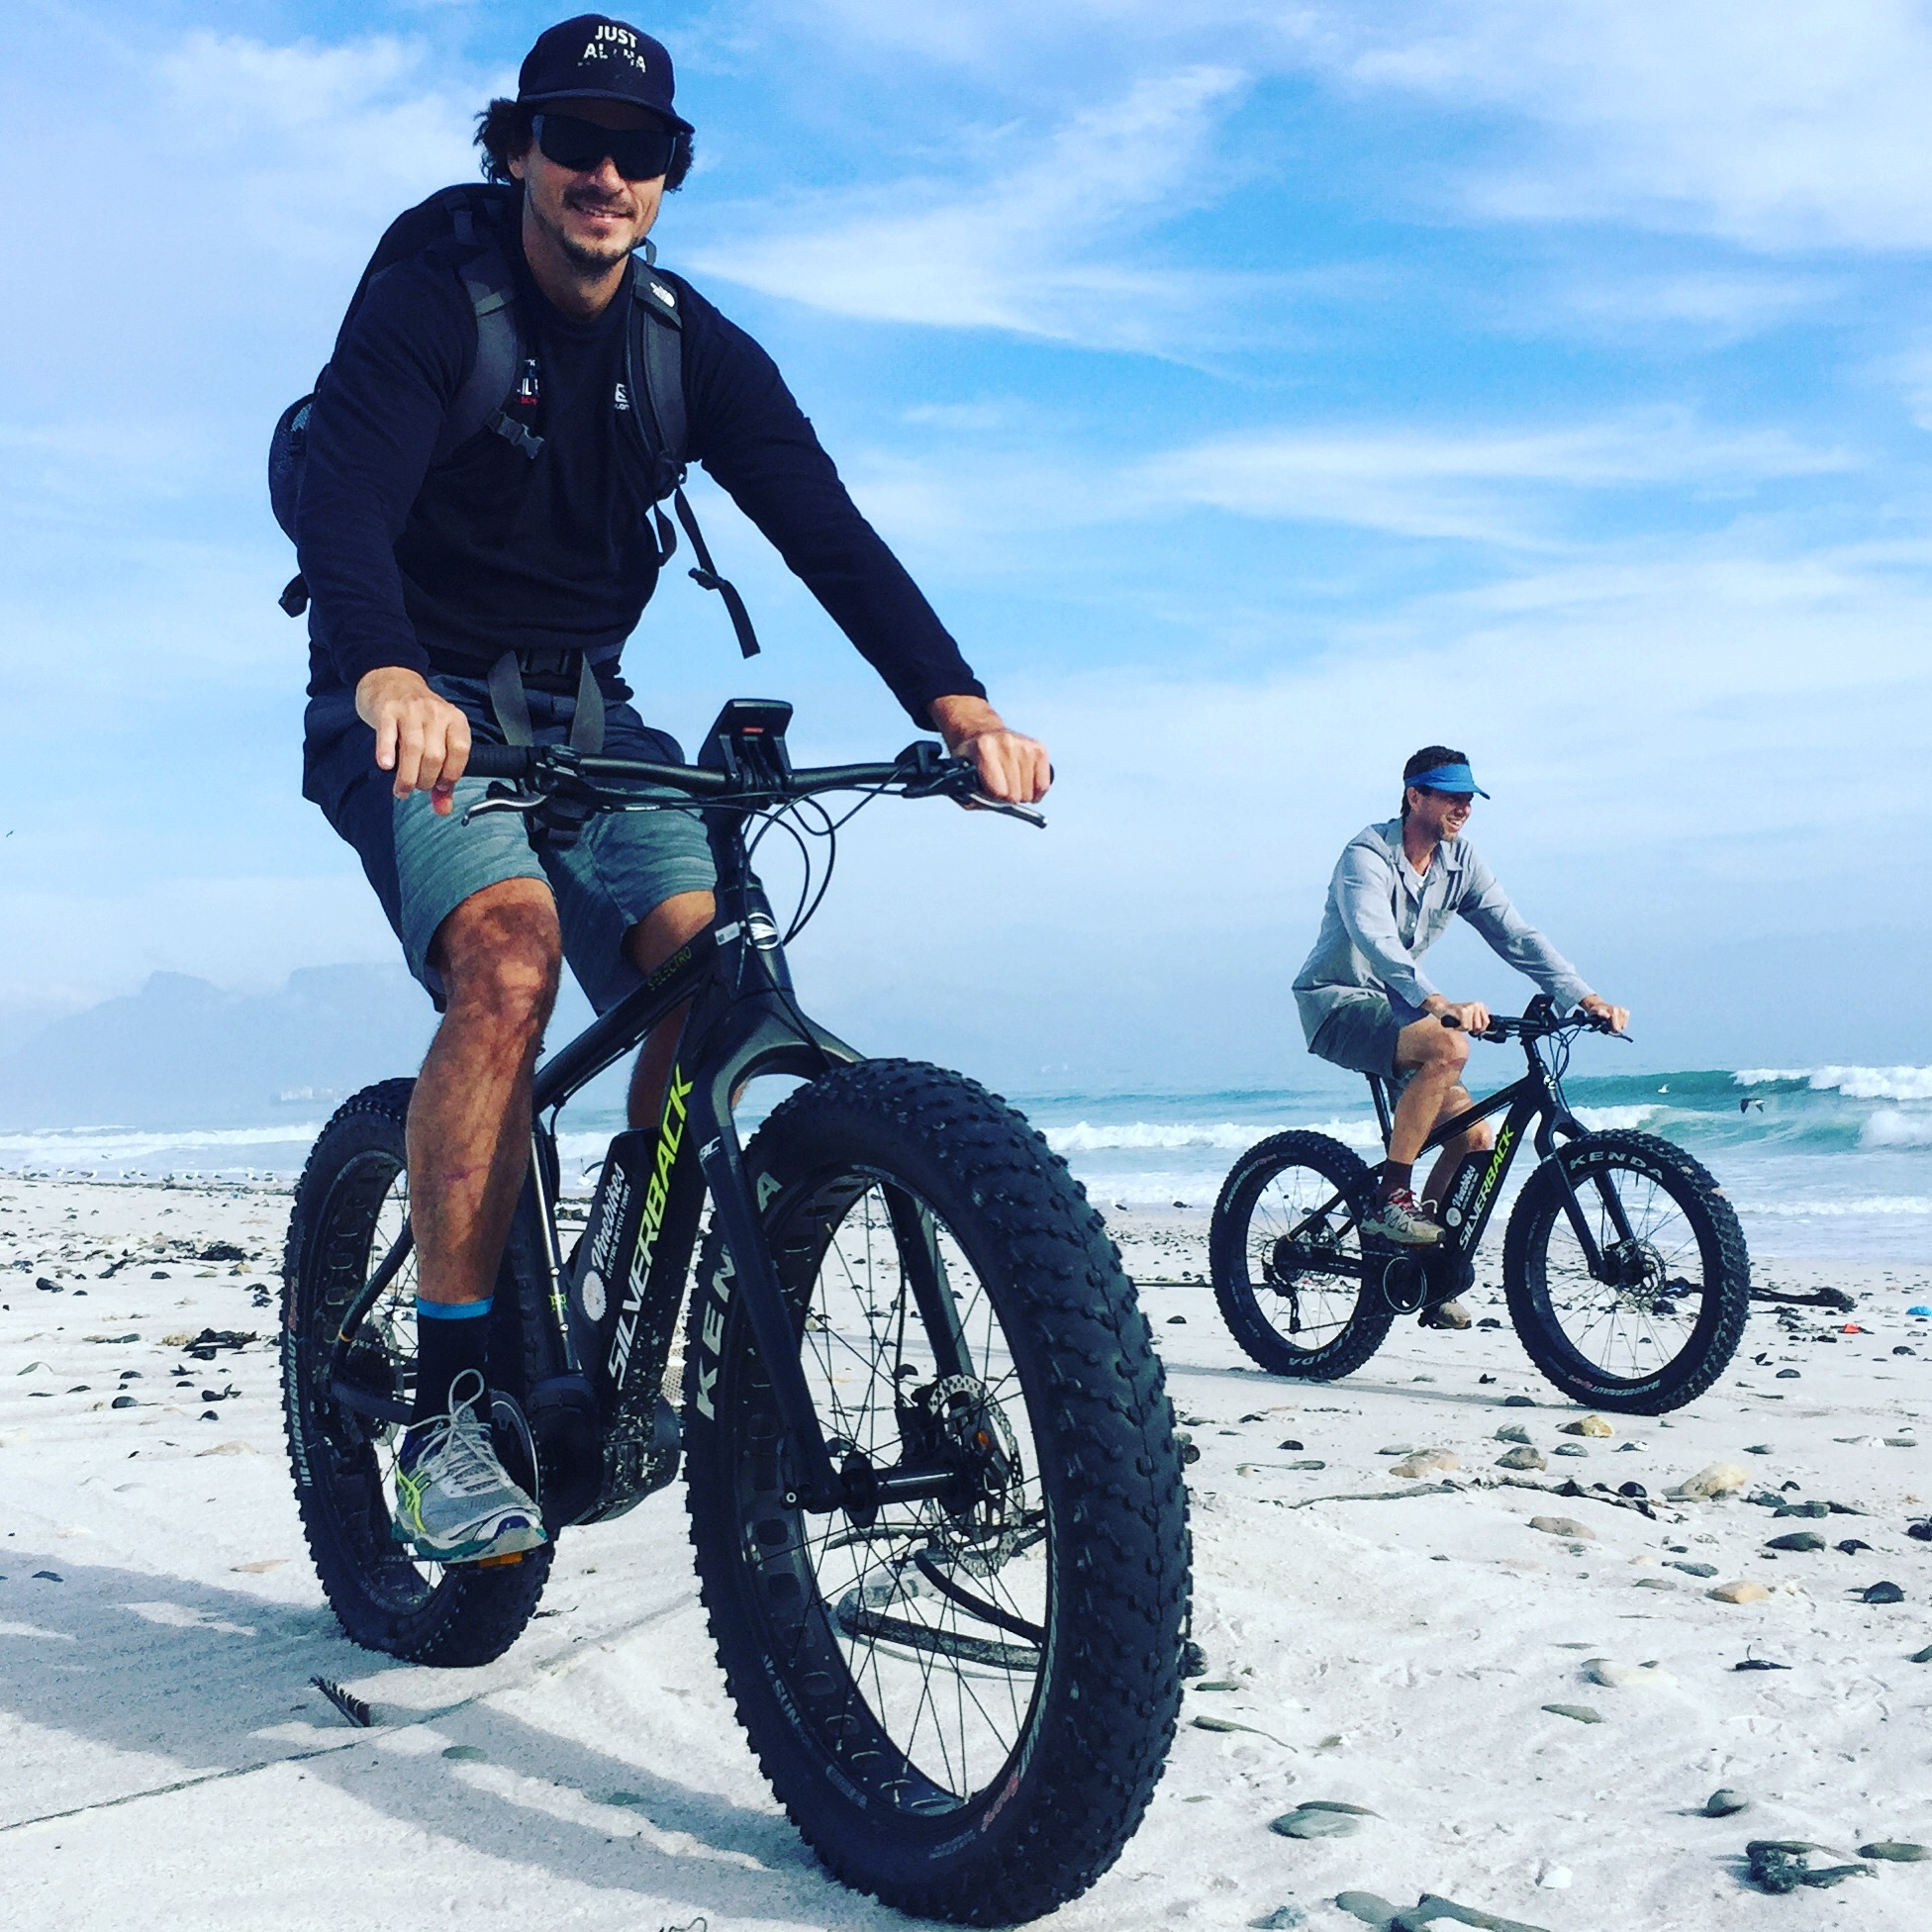 Tour de Weskus Strandfontein – Lambert's Bay